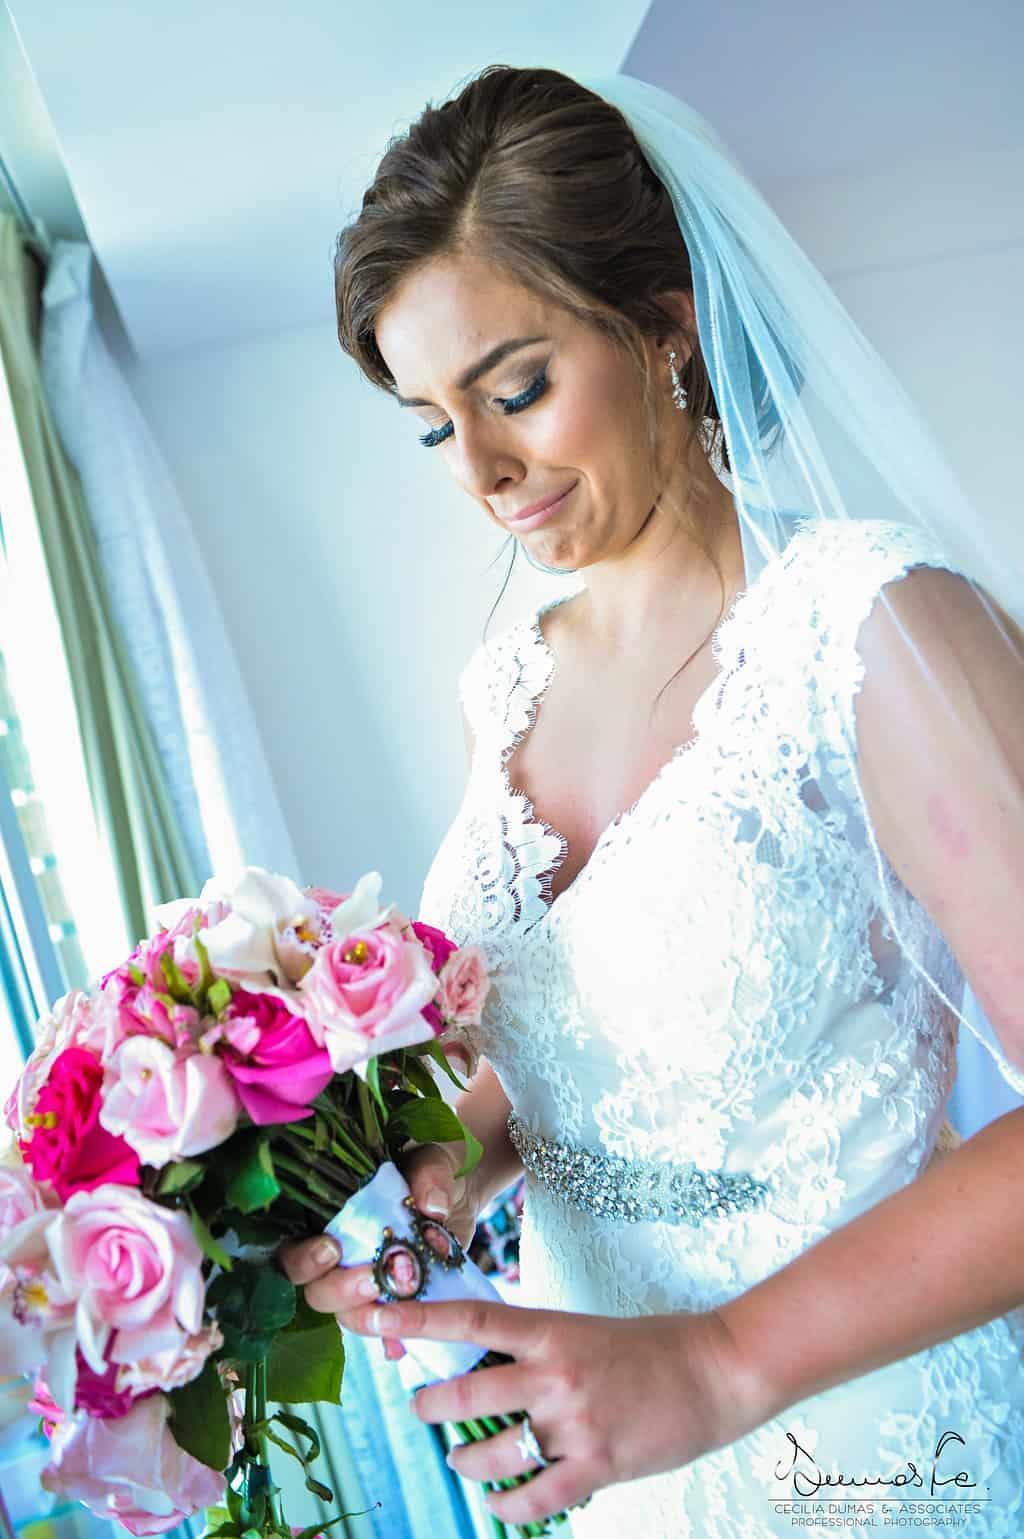 islamujeres-buhos-weddingphotography-giovannarosario17